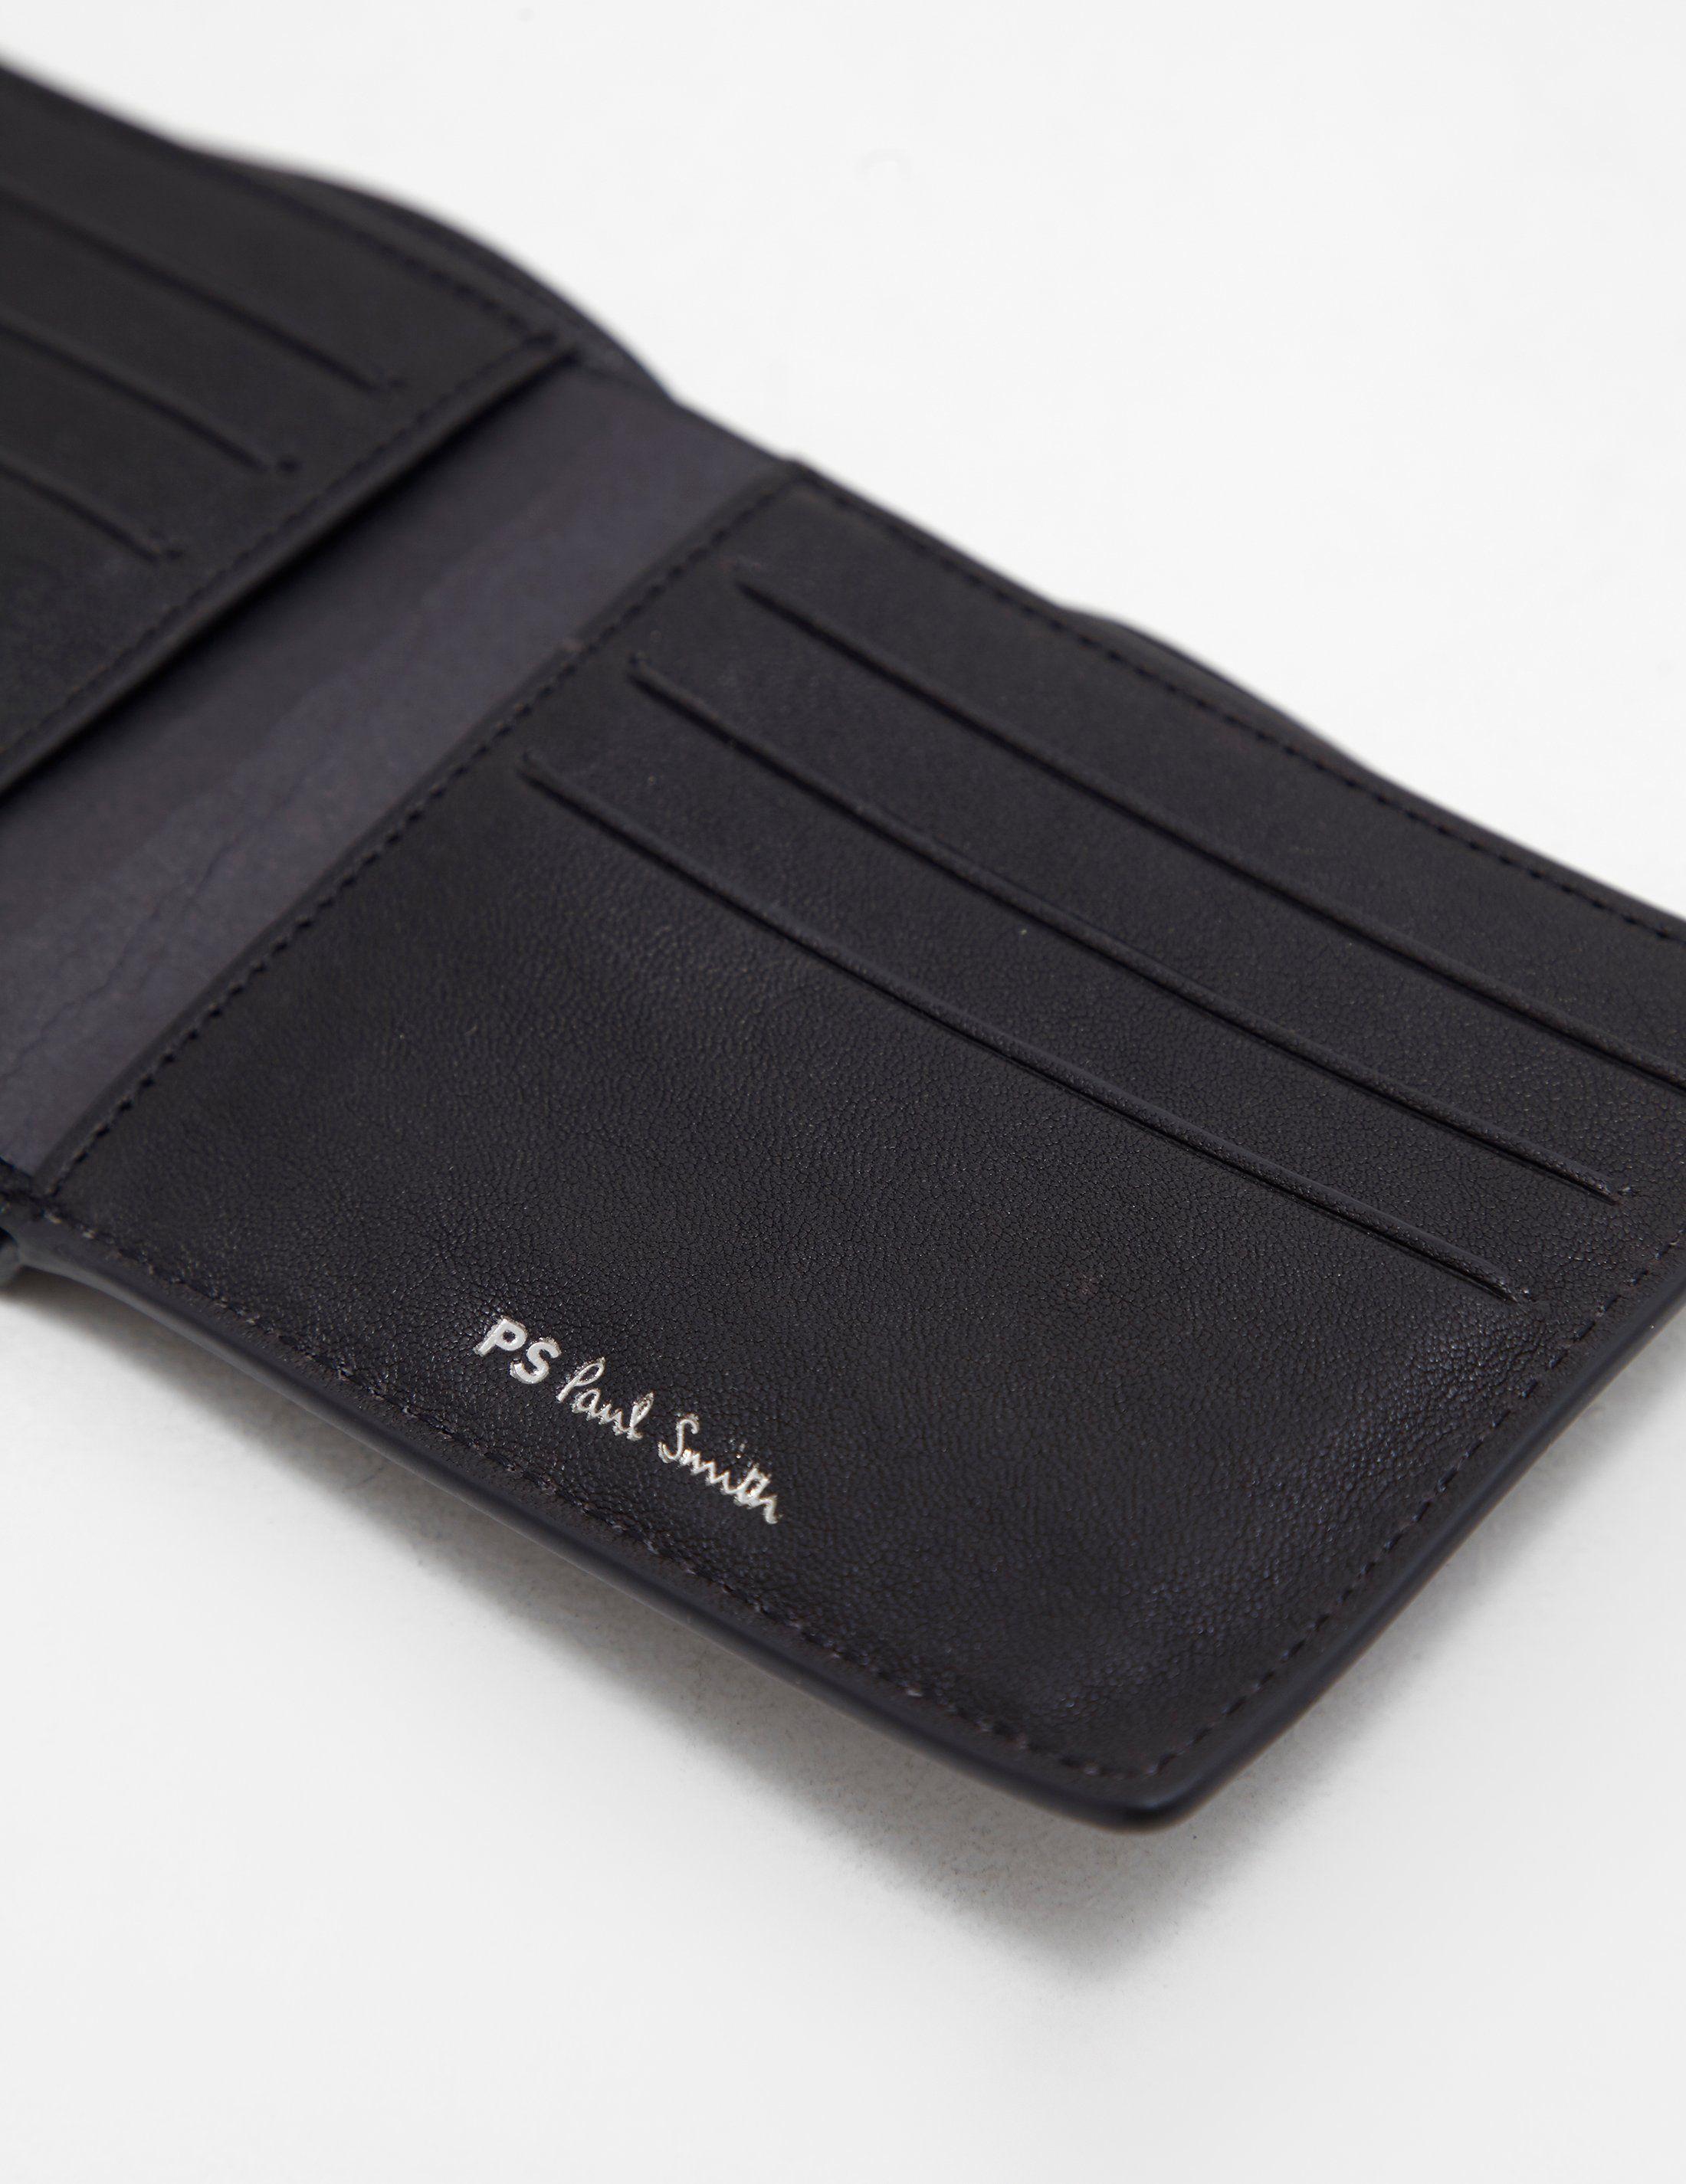 PS Paul Smith Zebra Wallet